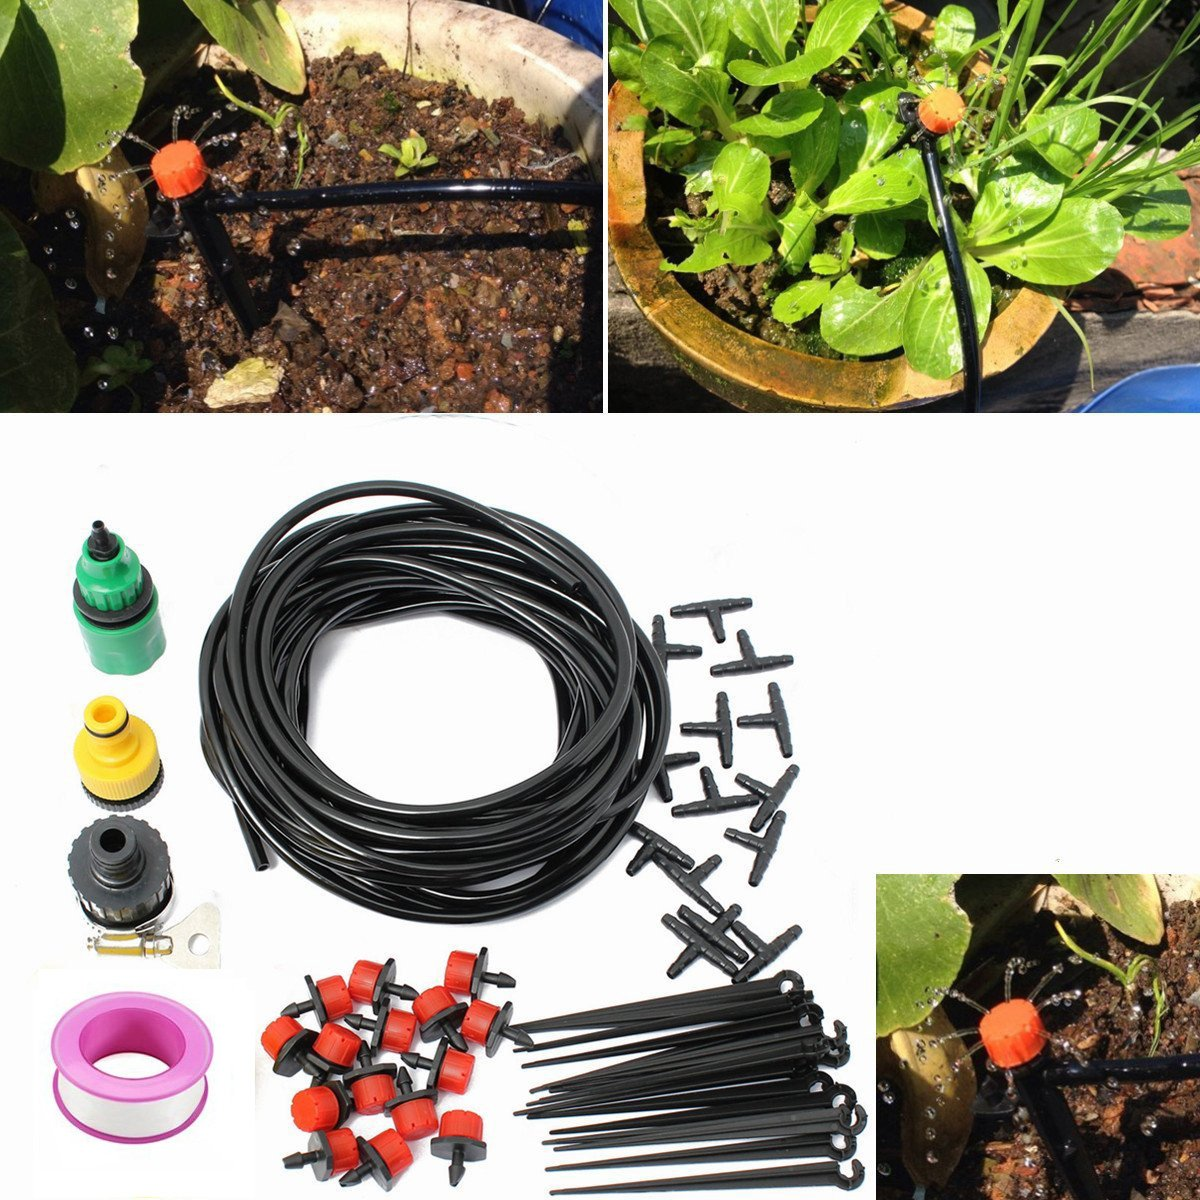 25m / 82ft Planta de jardinería Micro Sistema de riego por goteo Patio Atomización Micro Rociador Enfriamiento Kit: Amazon.es: Jardín